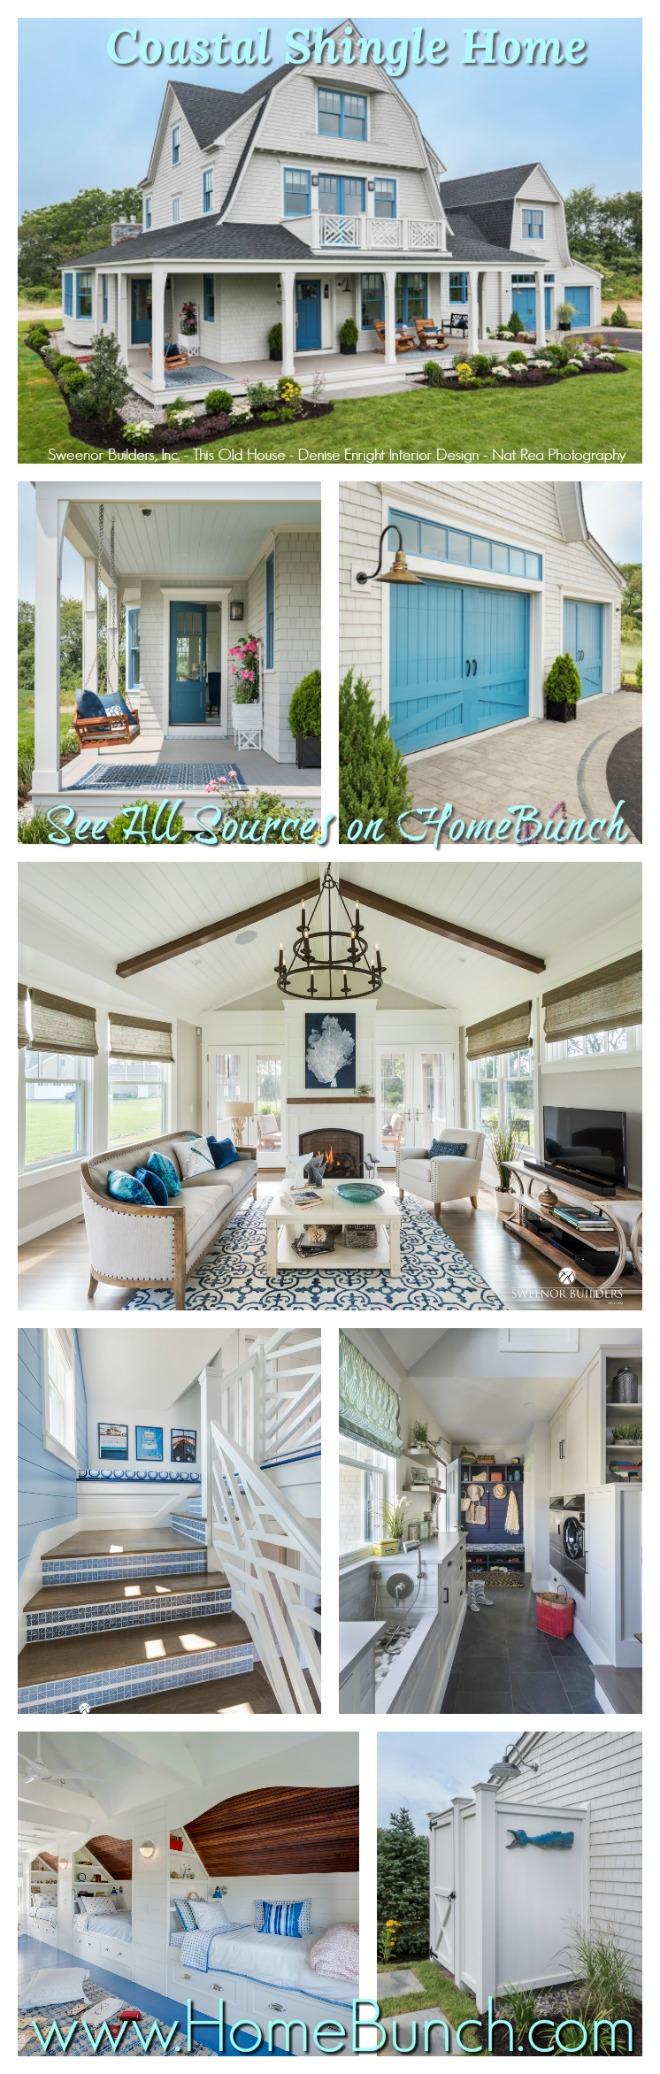 Lake House Interior Design Ideas Home Bunch Interior Design Ideas